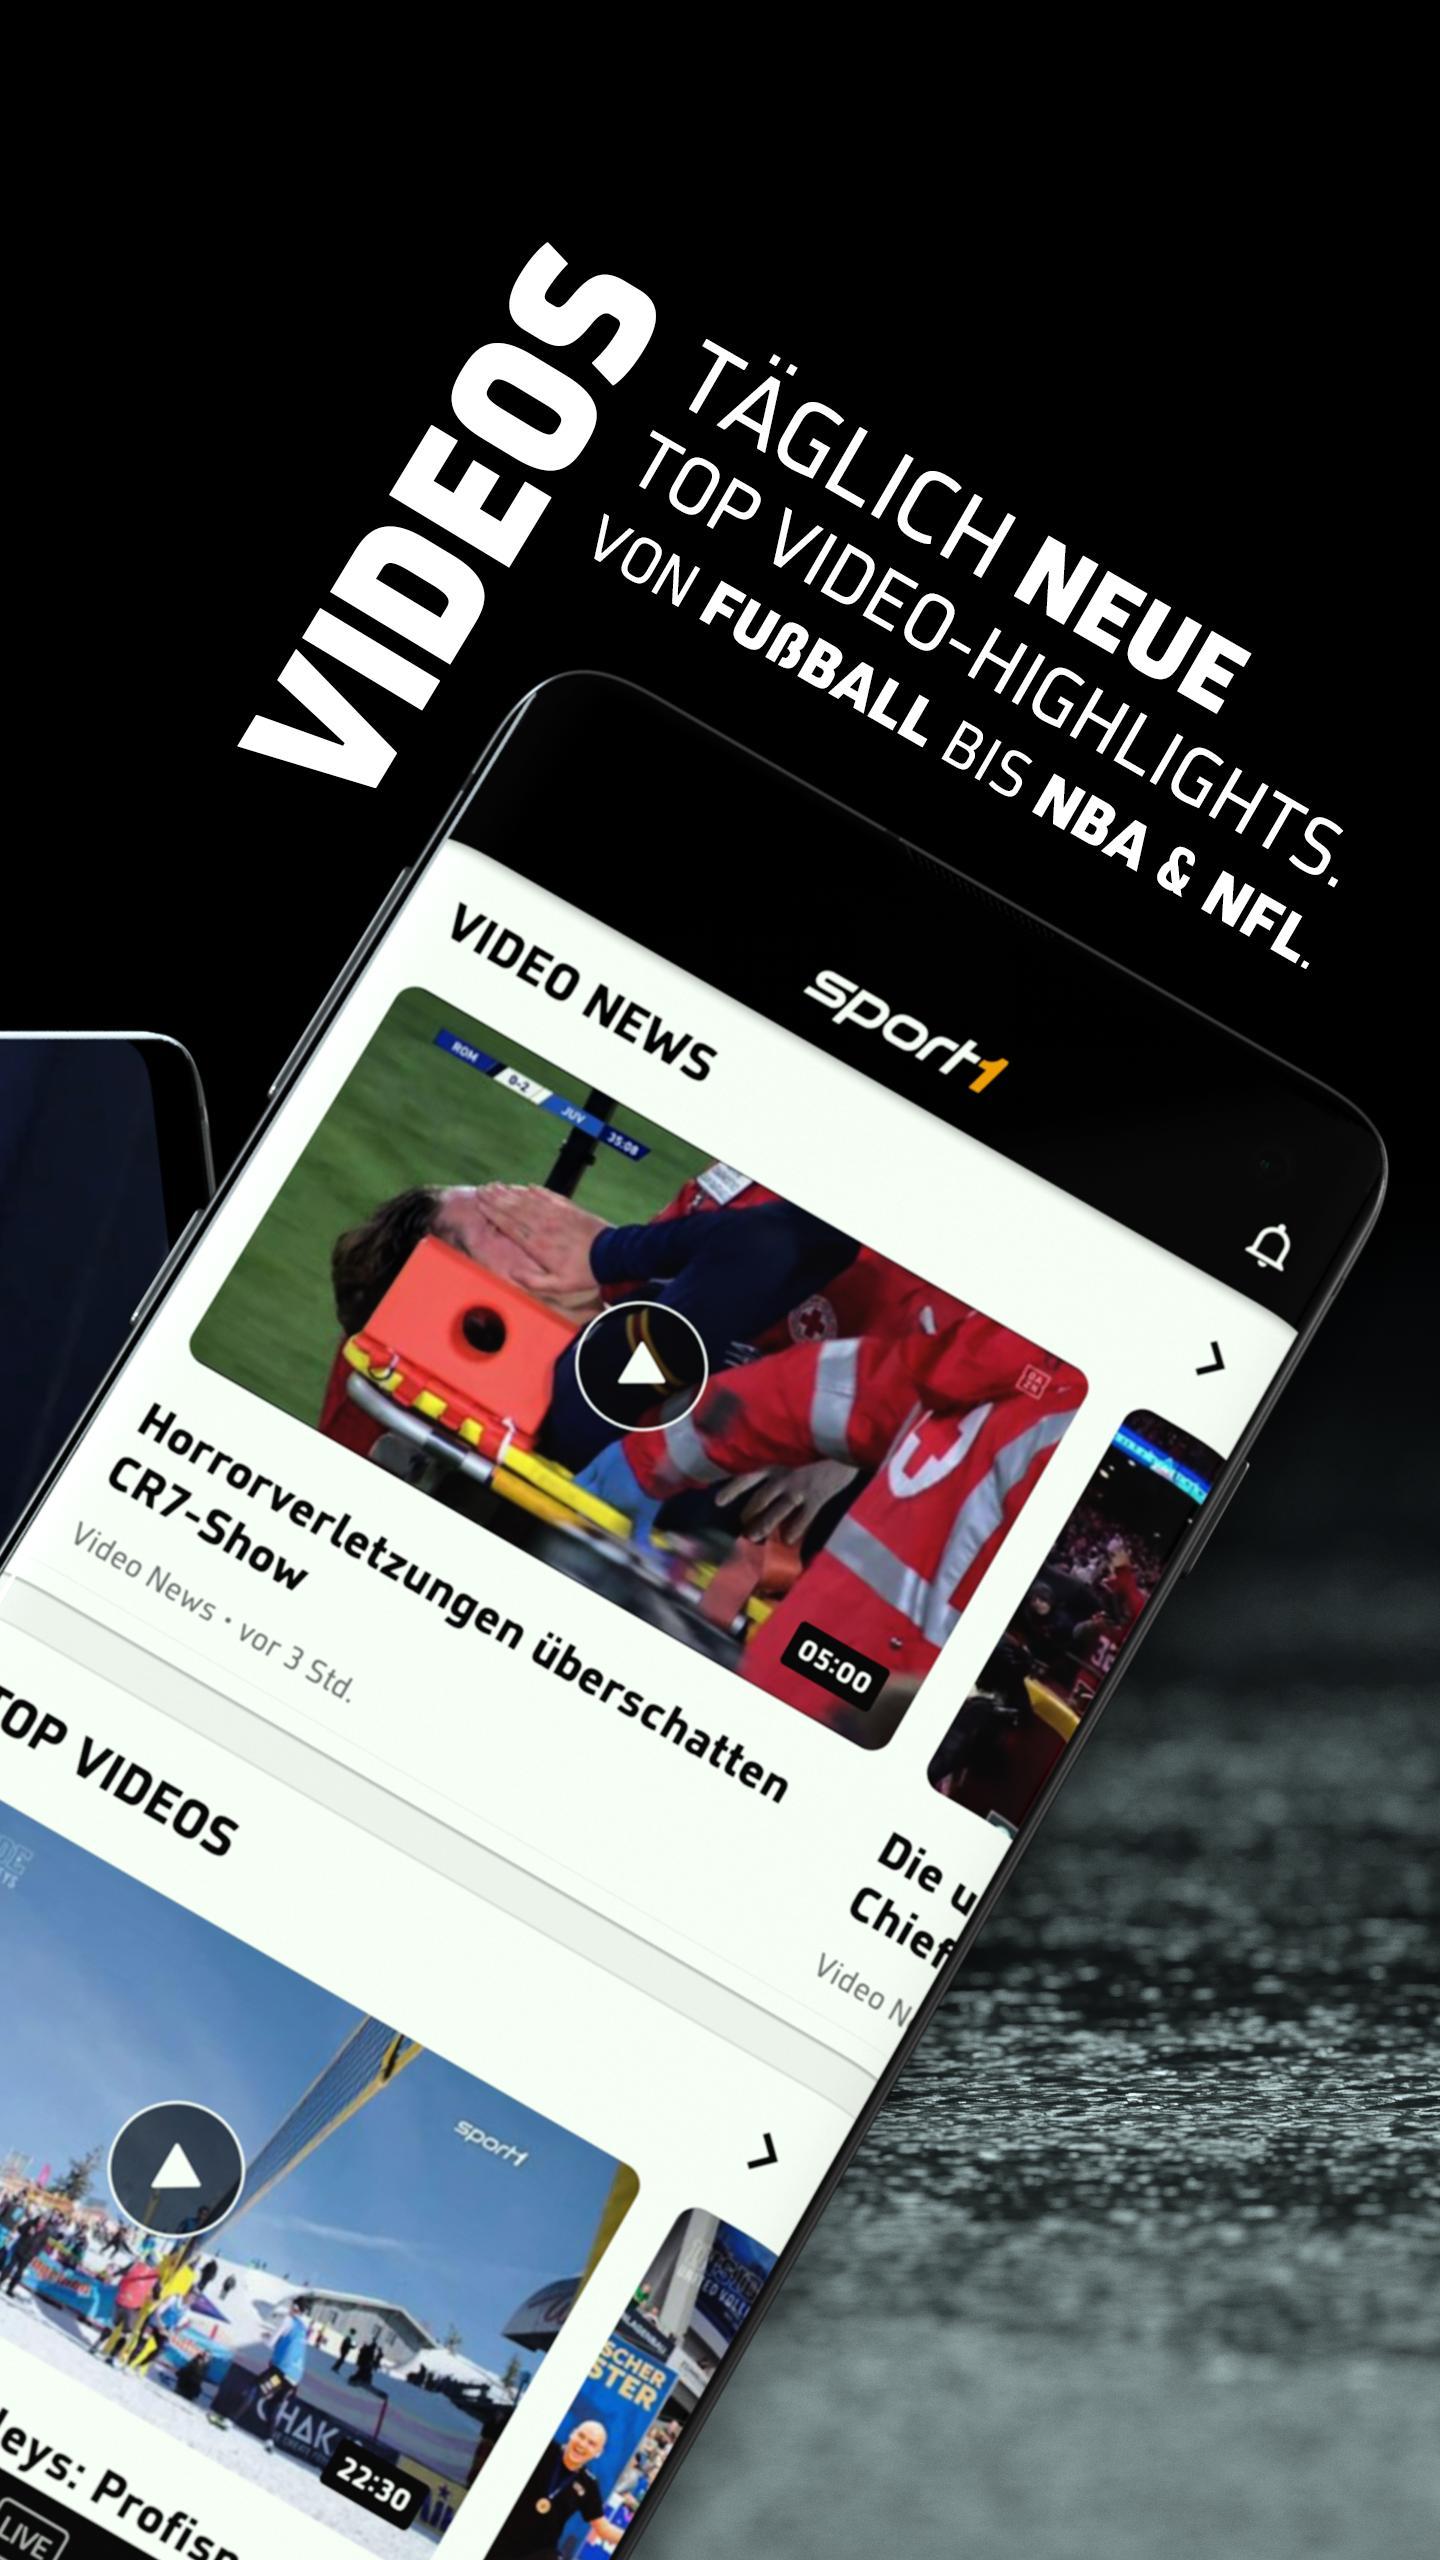 sport1 doppelpass live stream